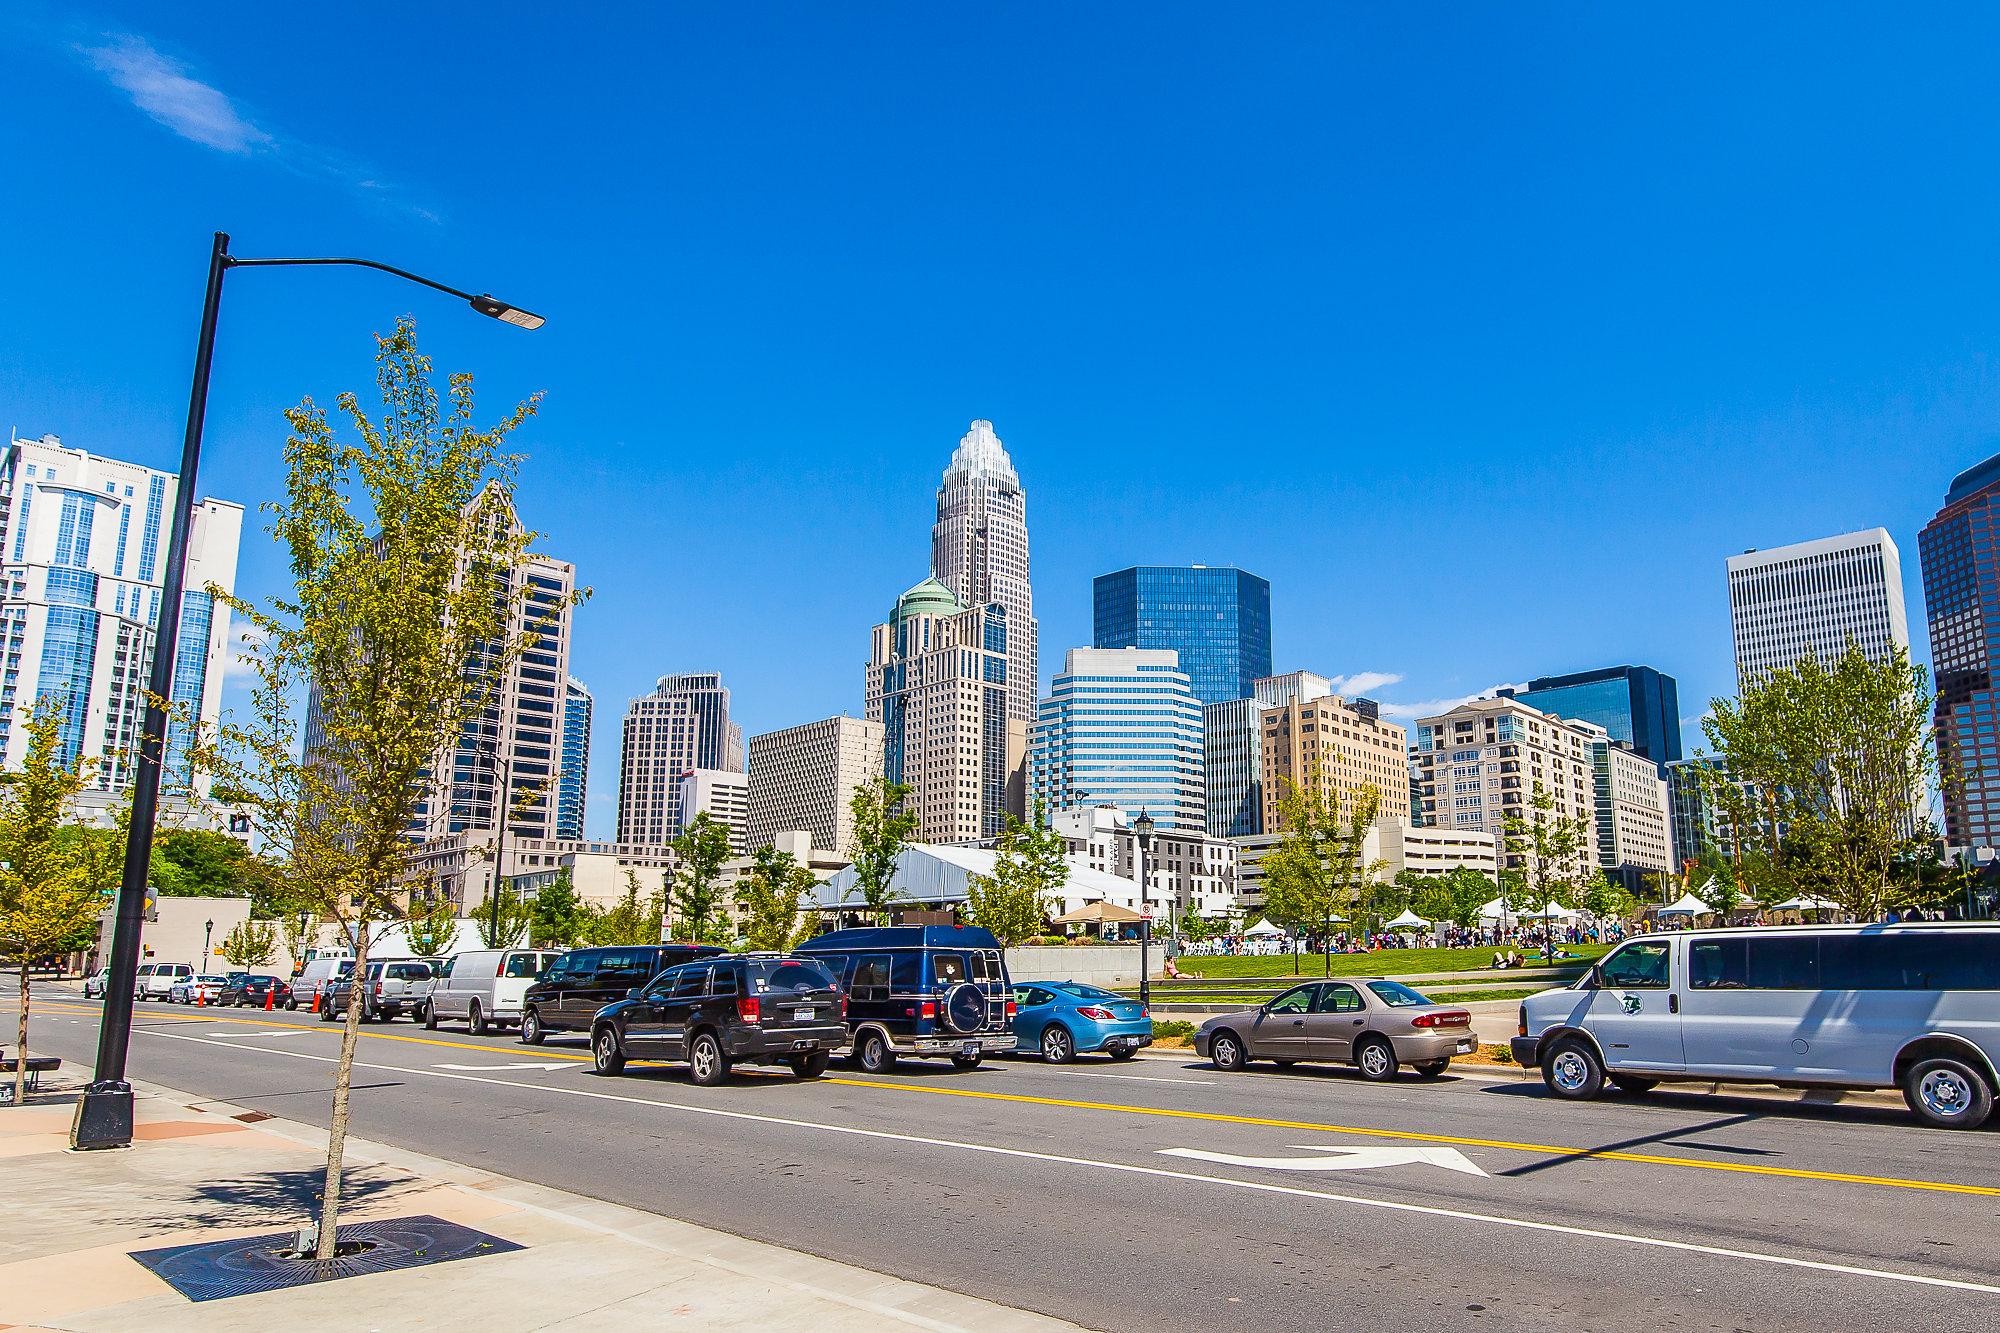 Top landscapers in charlotte nc - Top 10 Neighborhoods In Charlotte Nc In Real Estate Sales